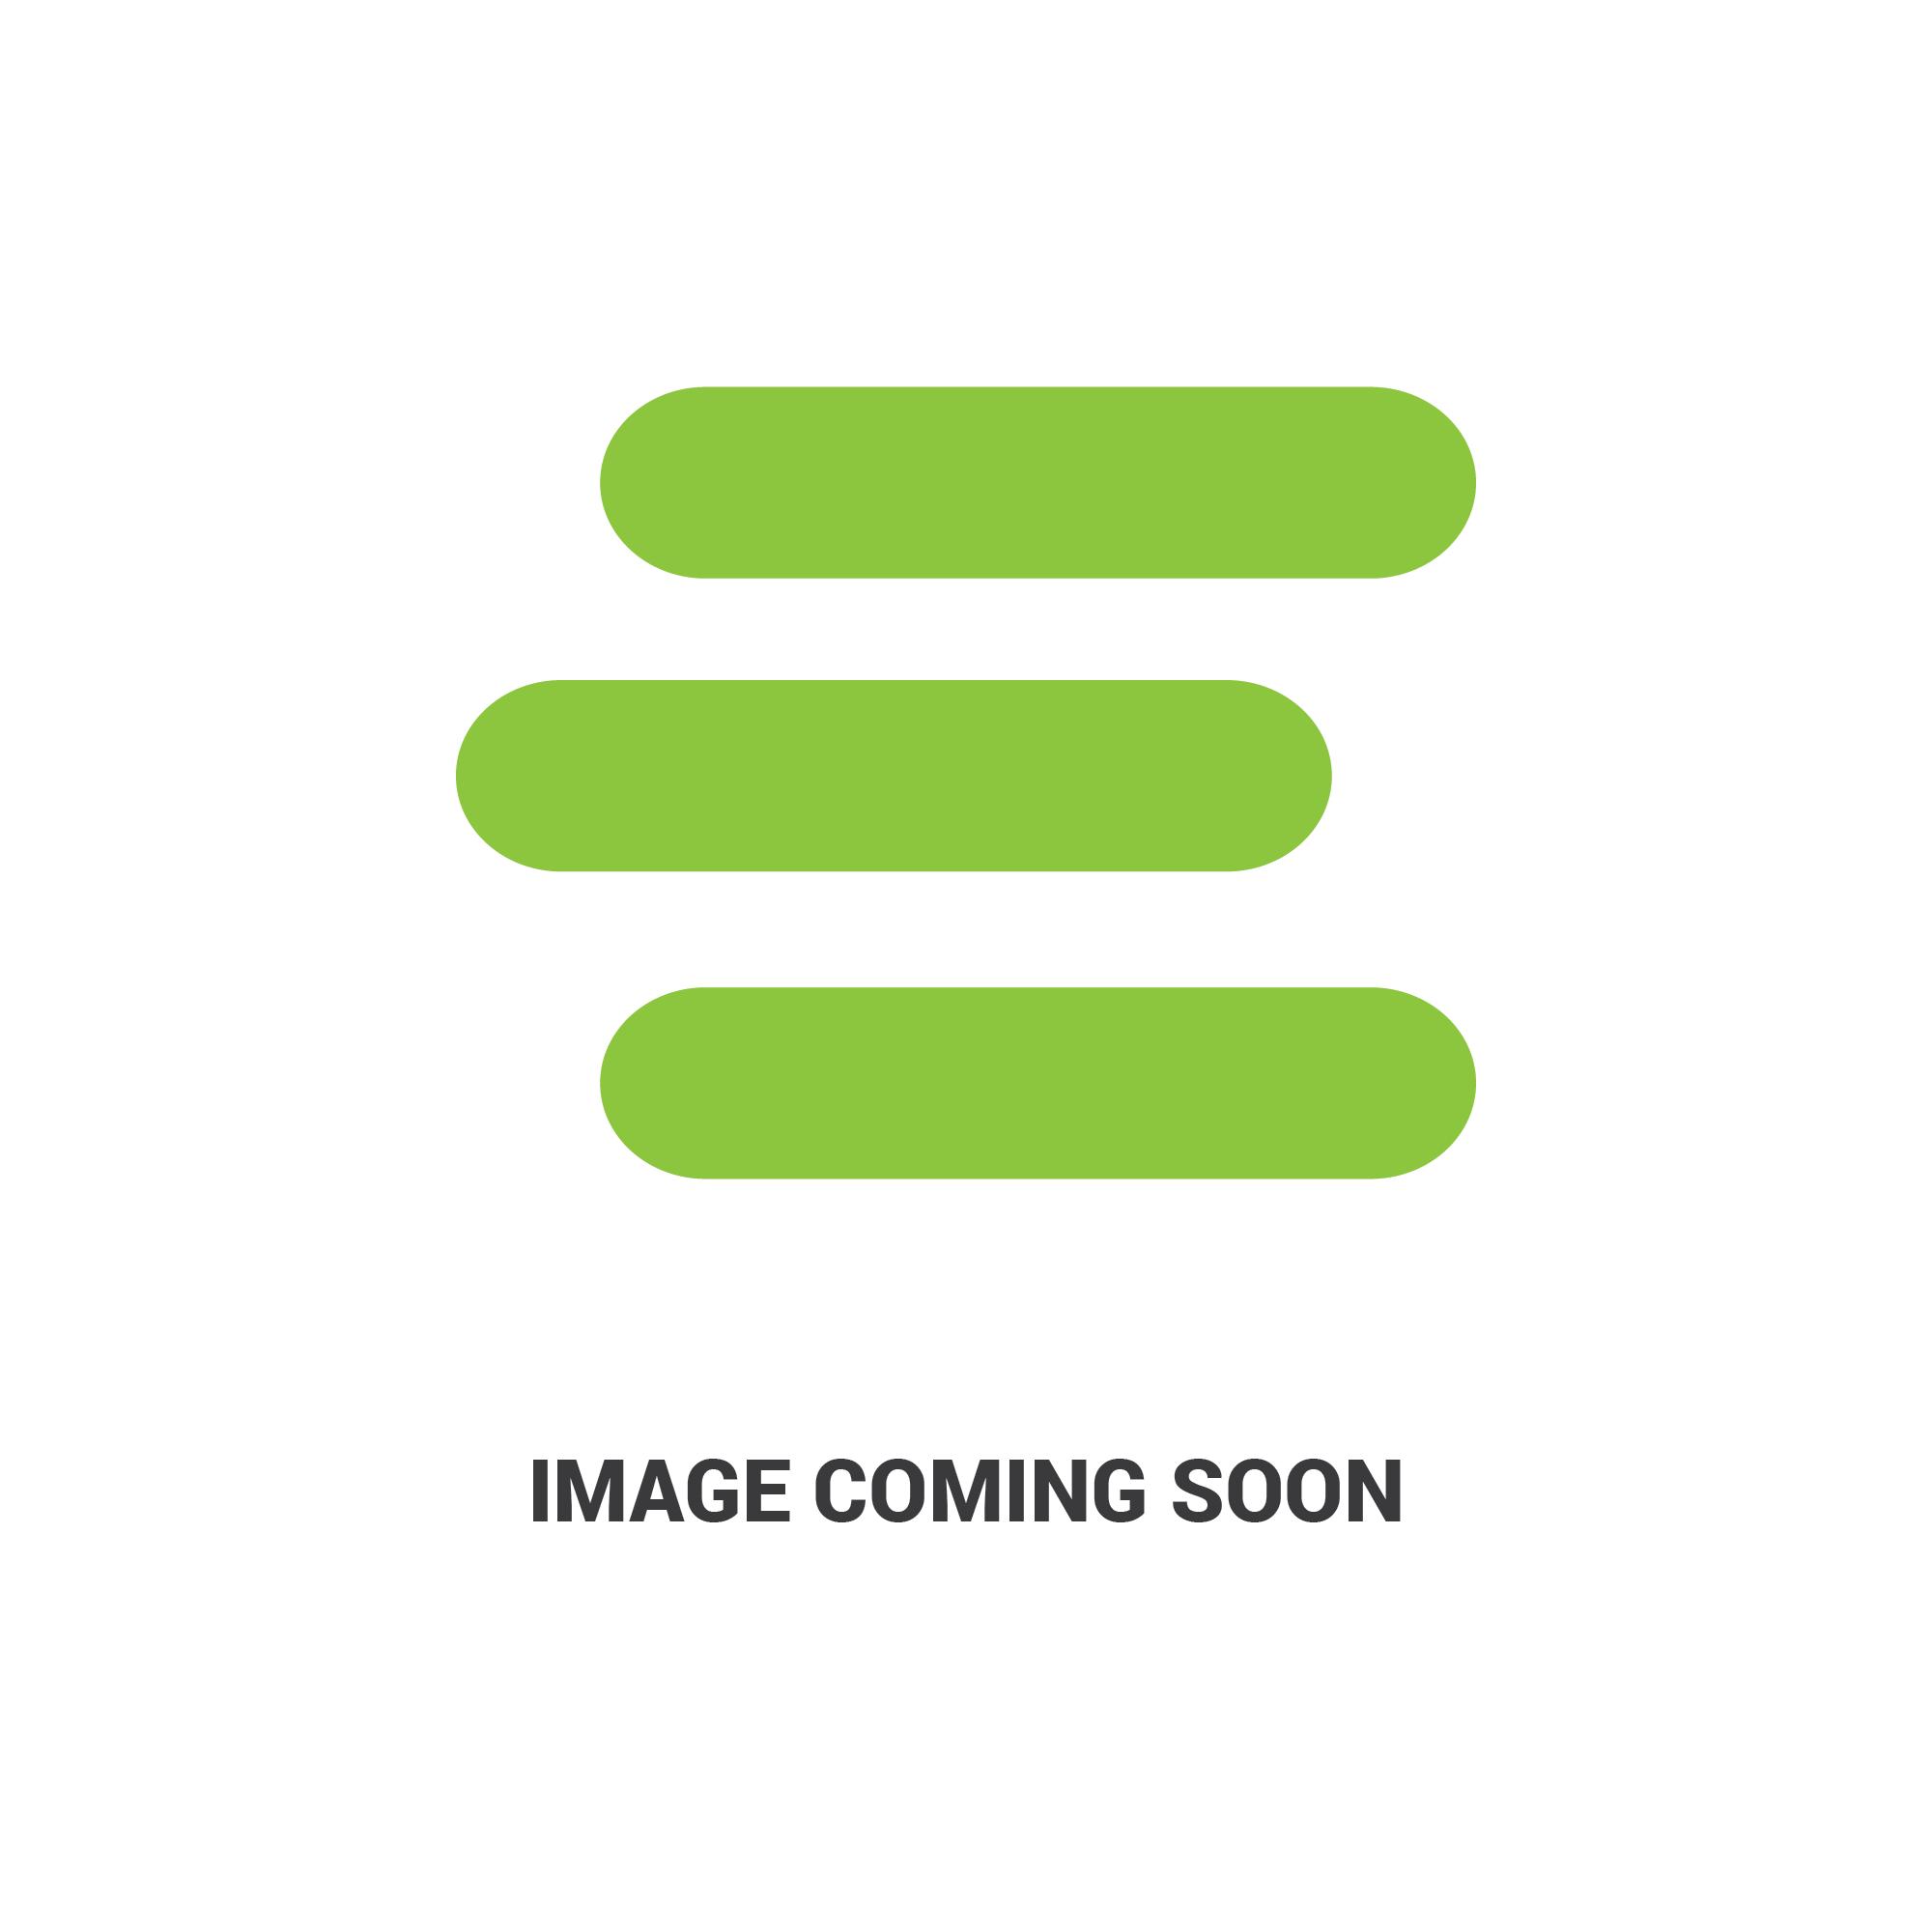 E-6670726edit 1.jpg